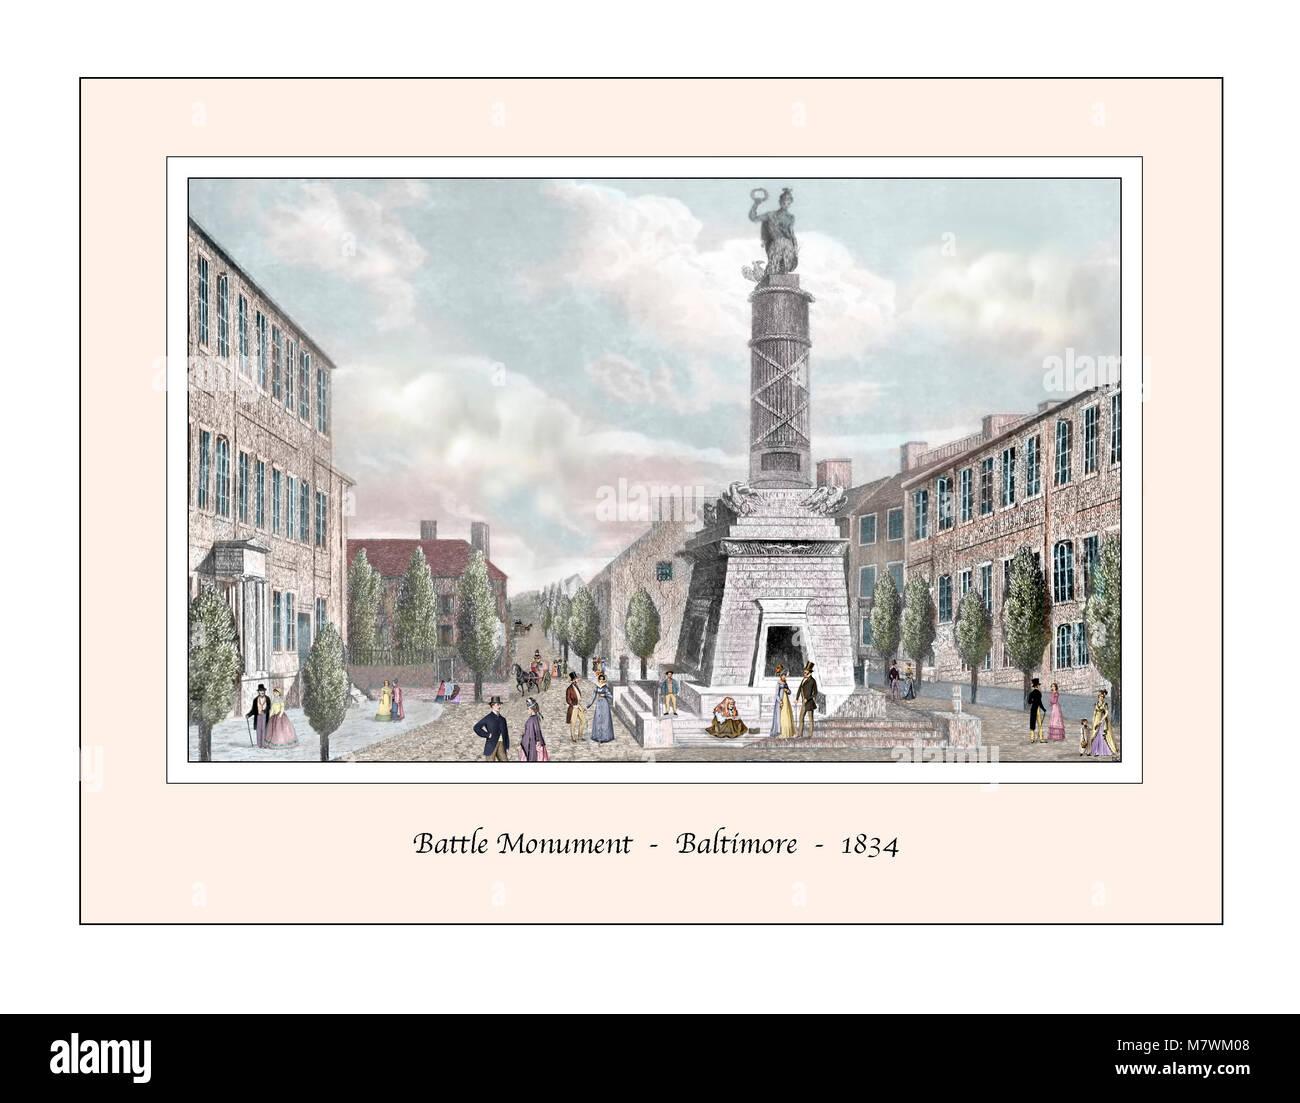 Battle Monument Baltimore Original Design based on a 19th century Engraving - Stock Image